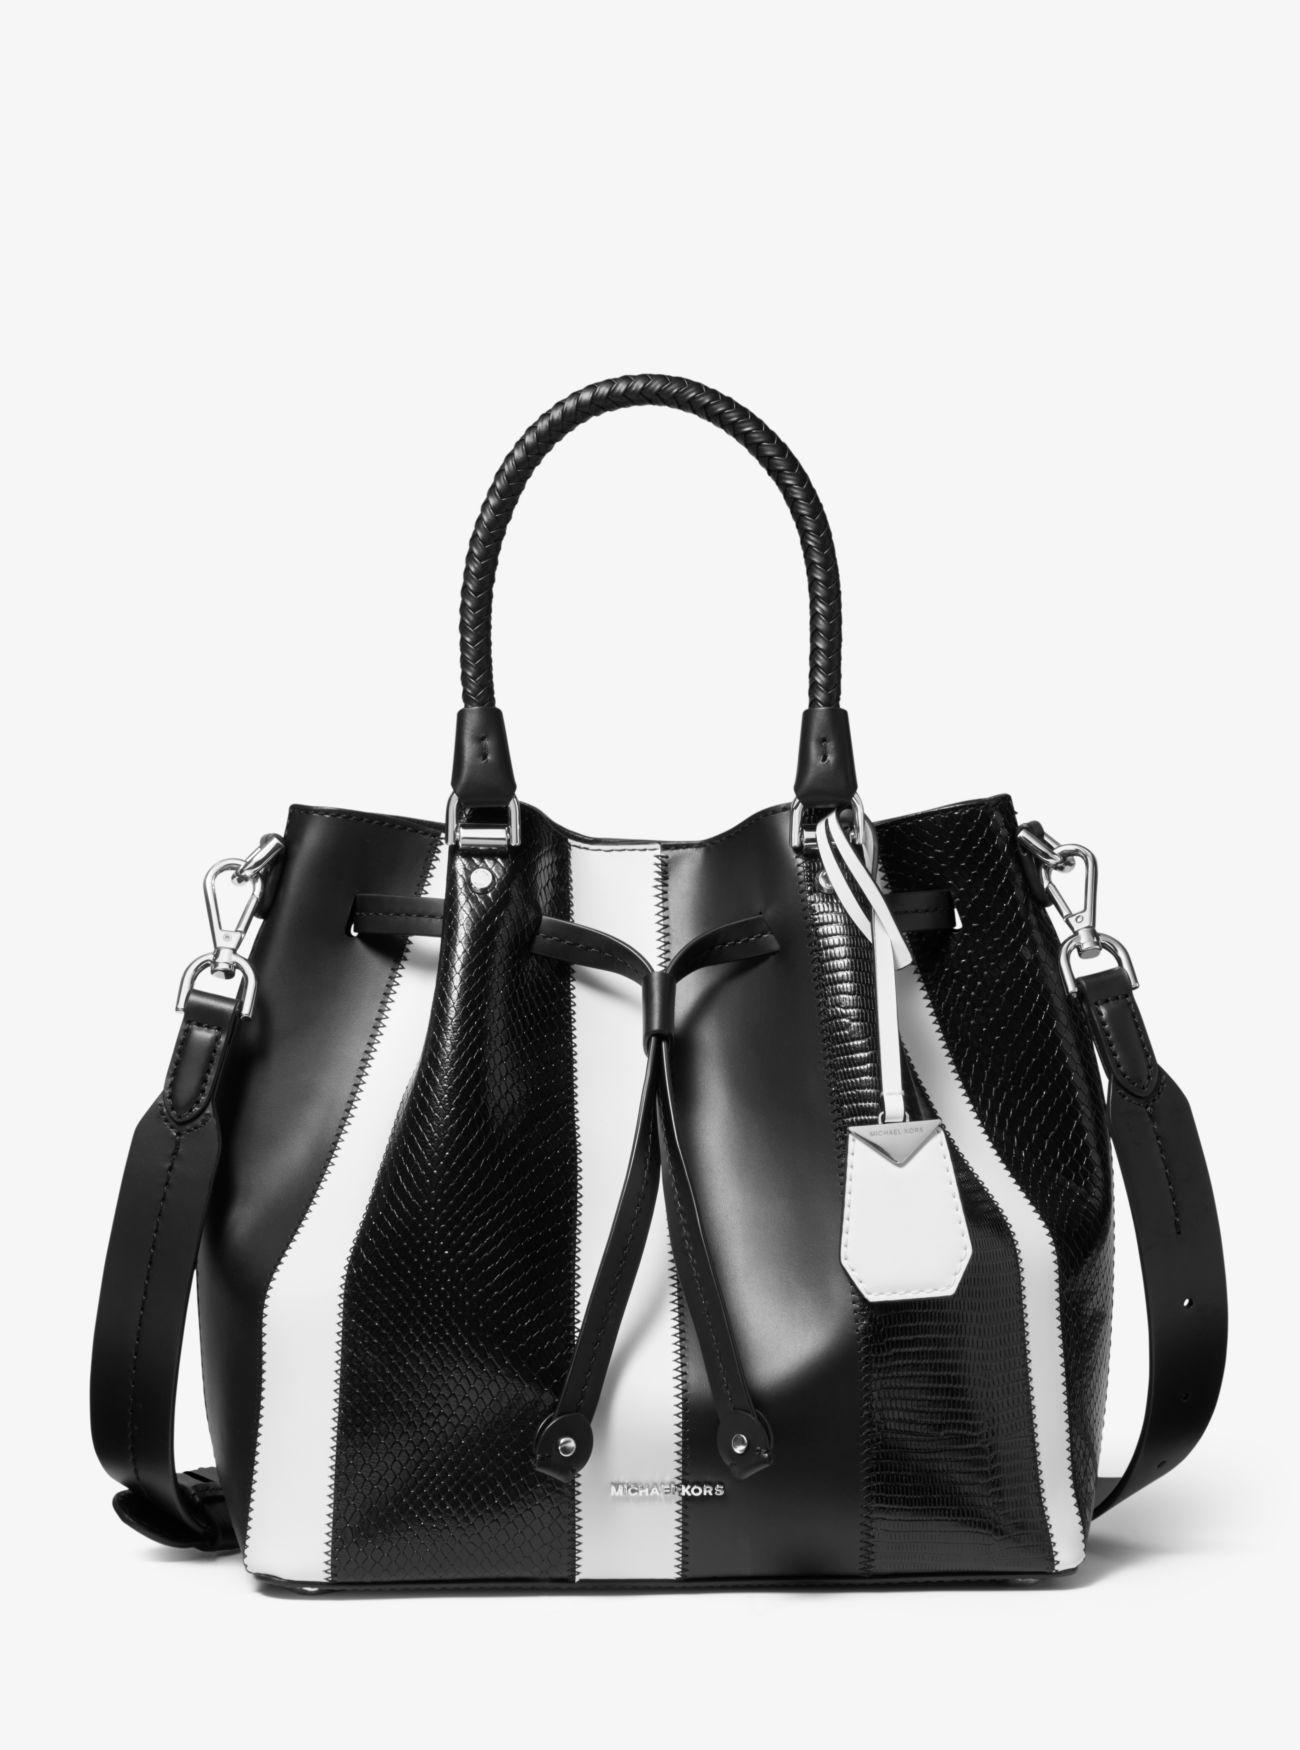 cadff8ed98f9c MICHAEL Michael Kors - Black Blakely Medium Striped Leather Bucket Bag -  Lyst. View fullscreen